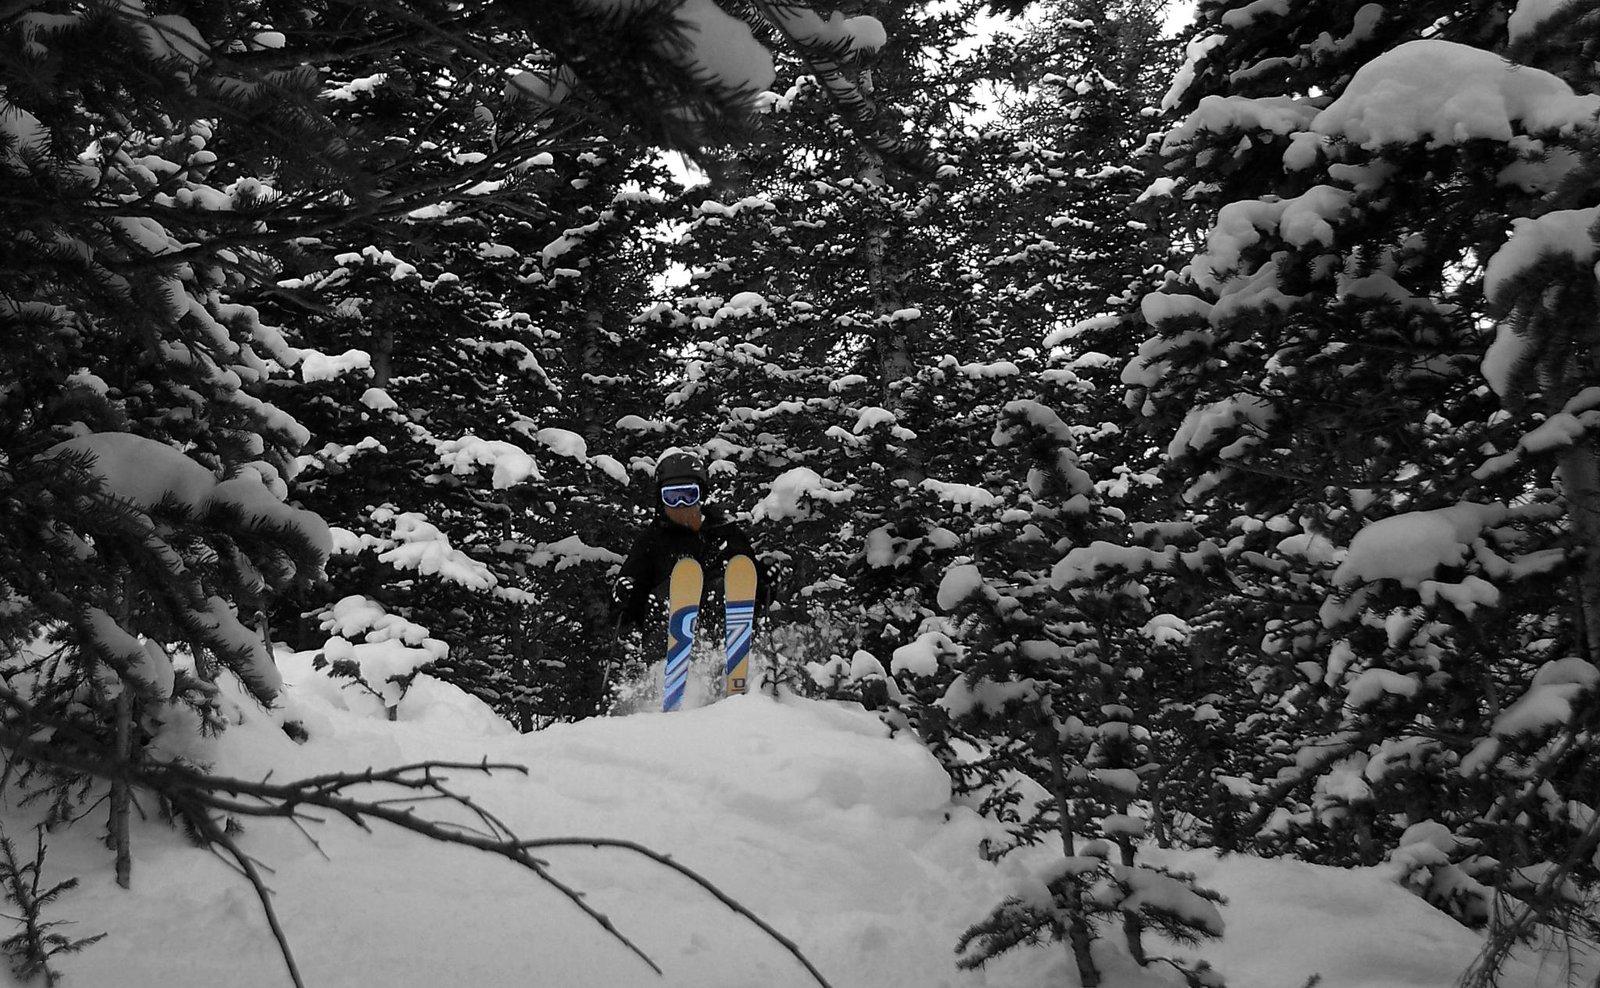 Roundtop Riders: Colorado Pow Pow